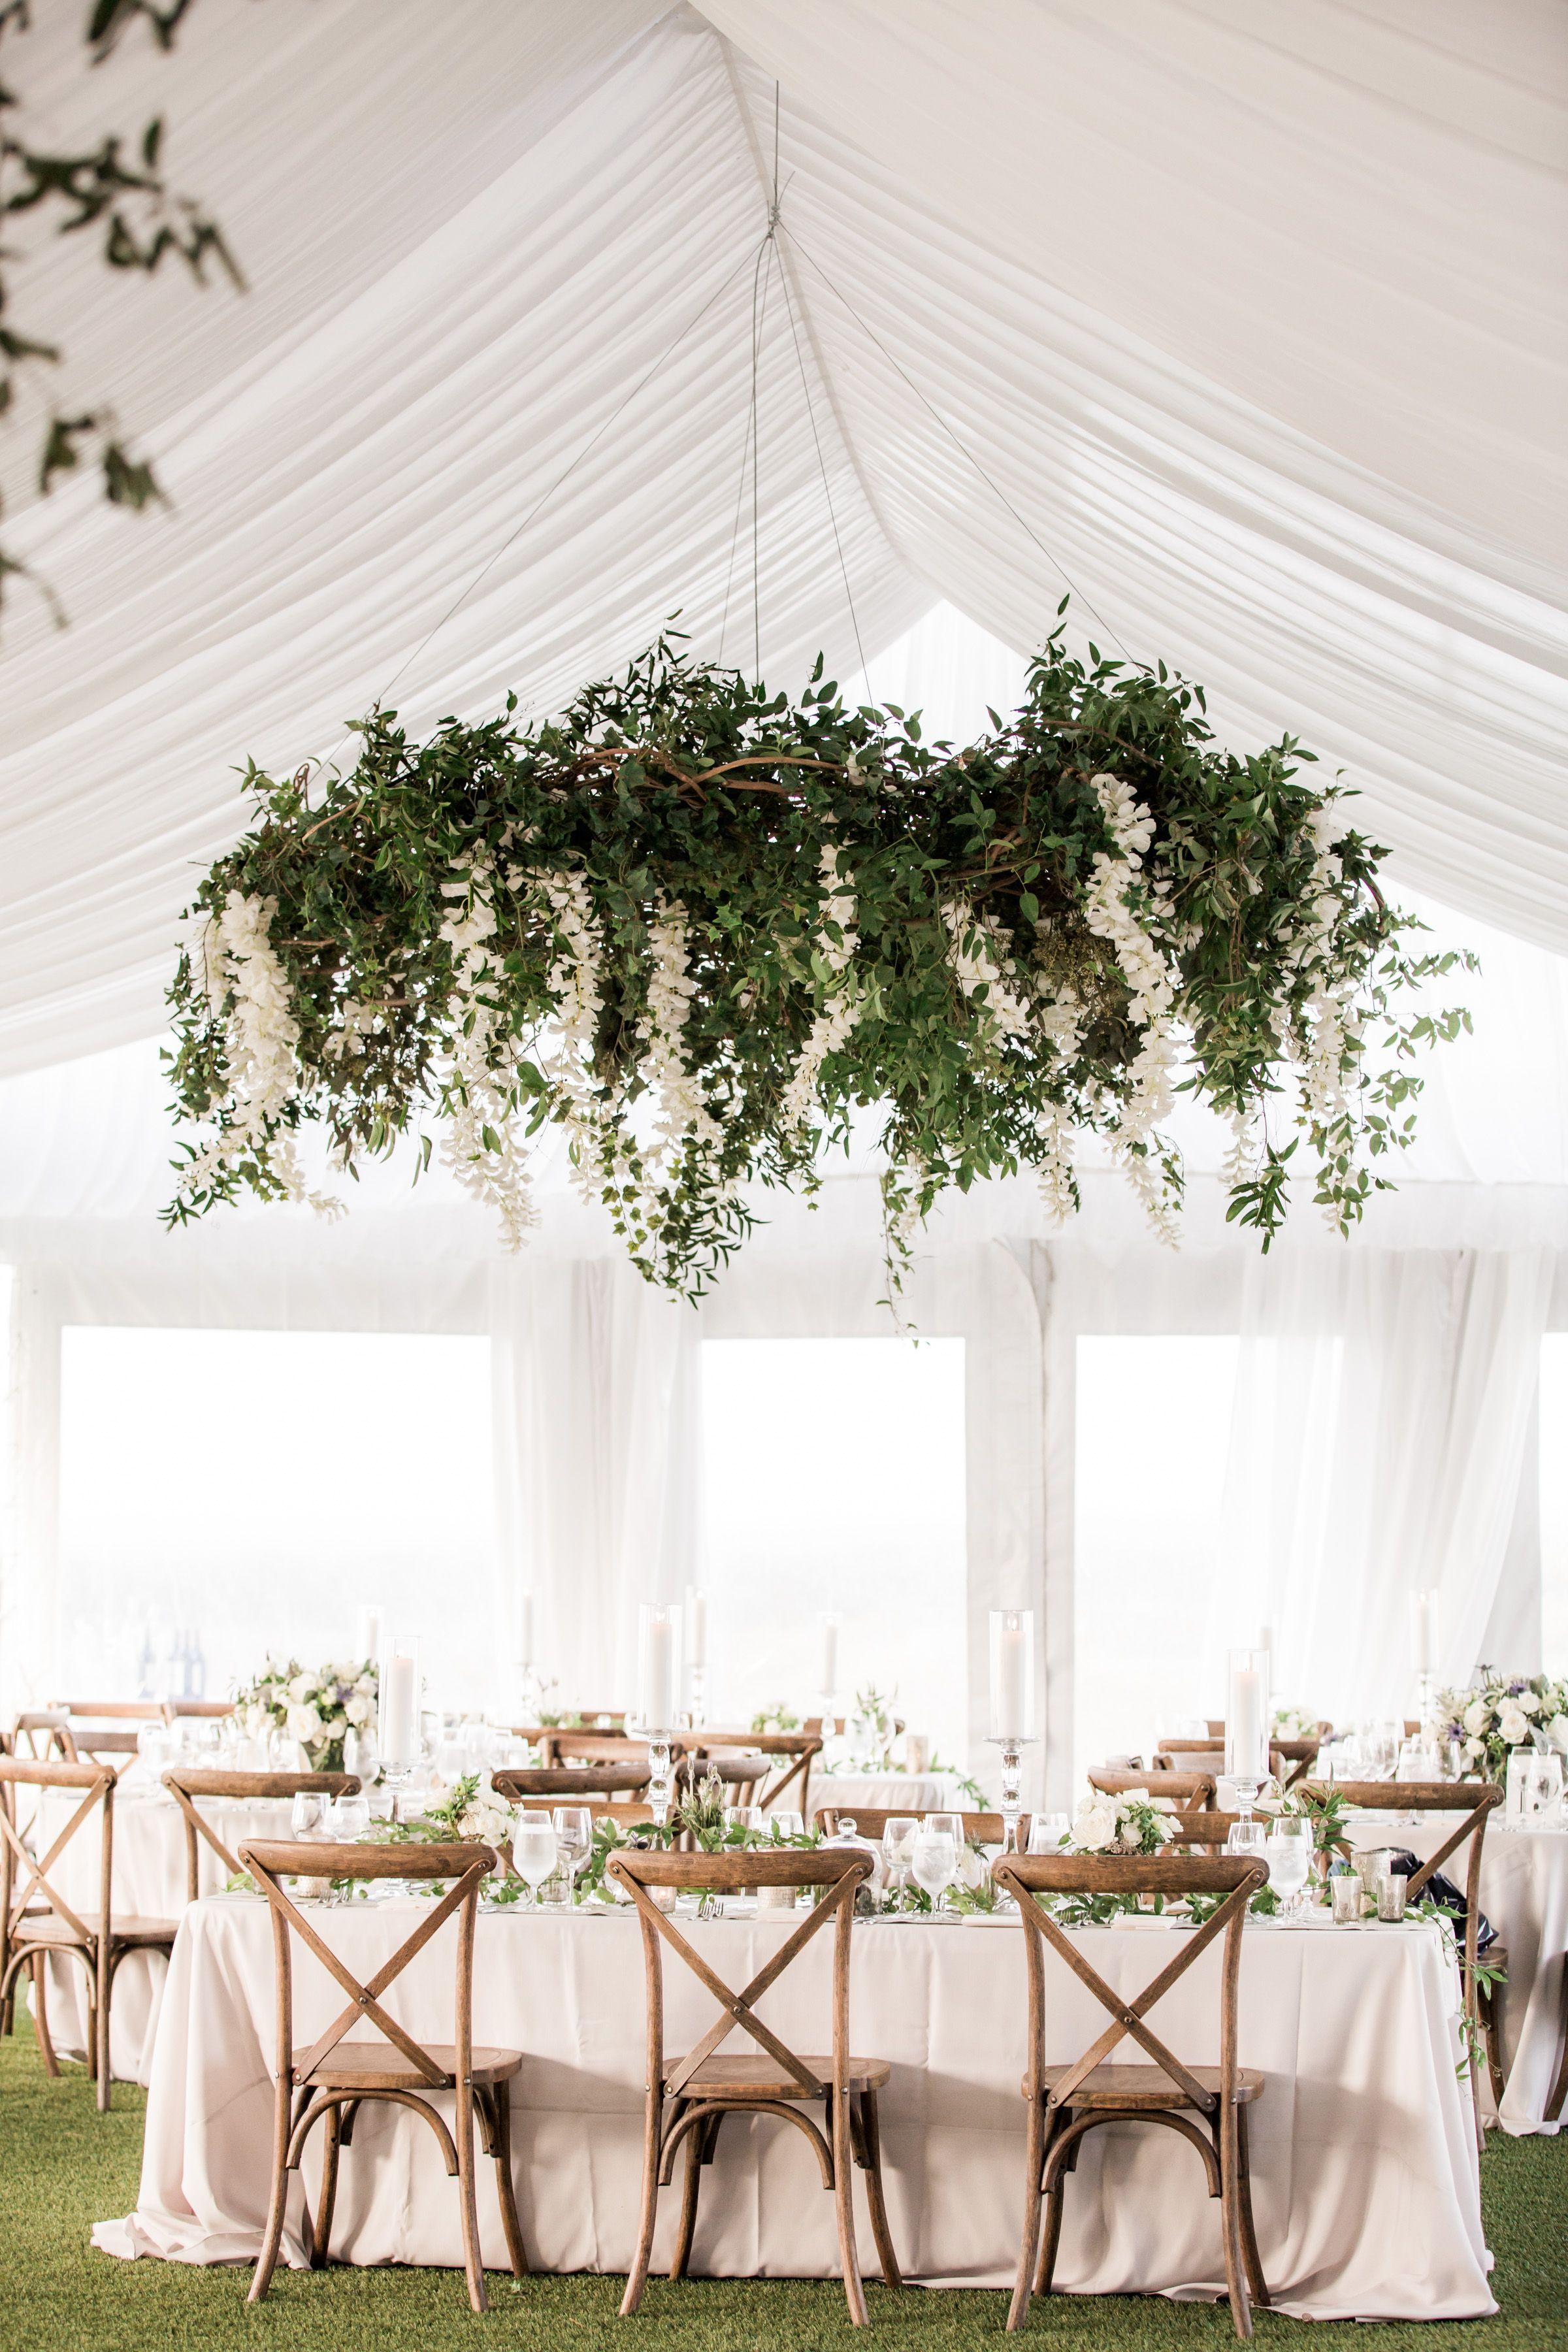 Hanging Floral Chandelier Floral Design By Winston Flowers Wedding Chandelier Floral Chandelier Wedding Wedding Rentals Decor